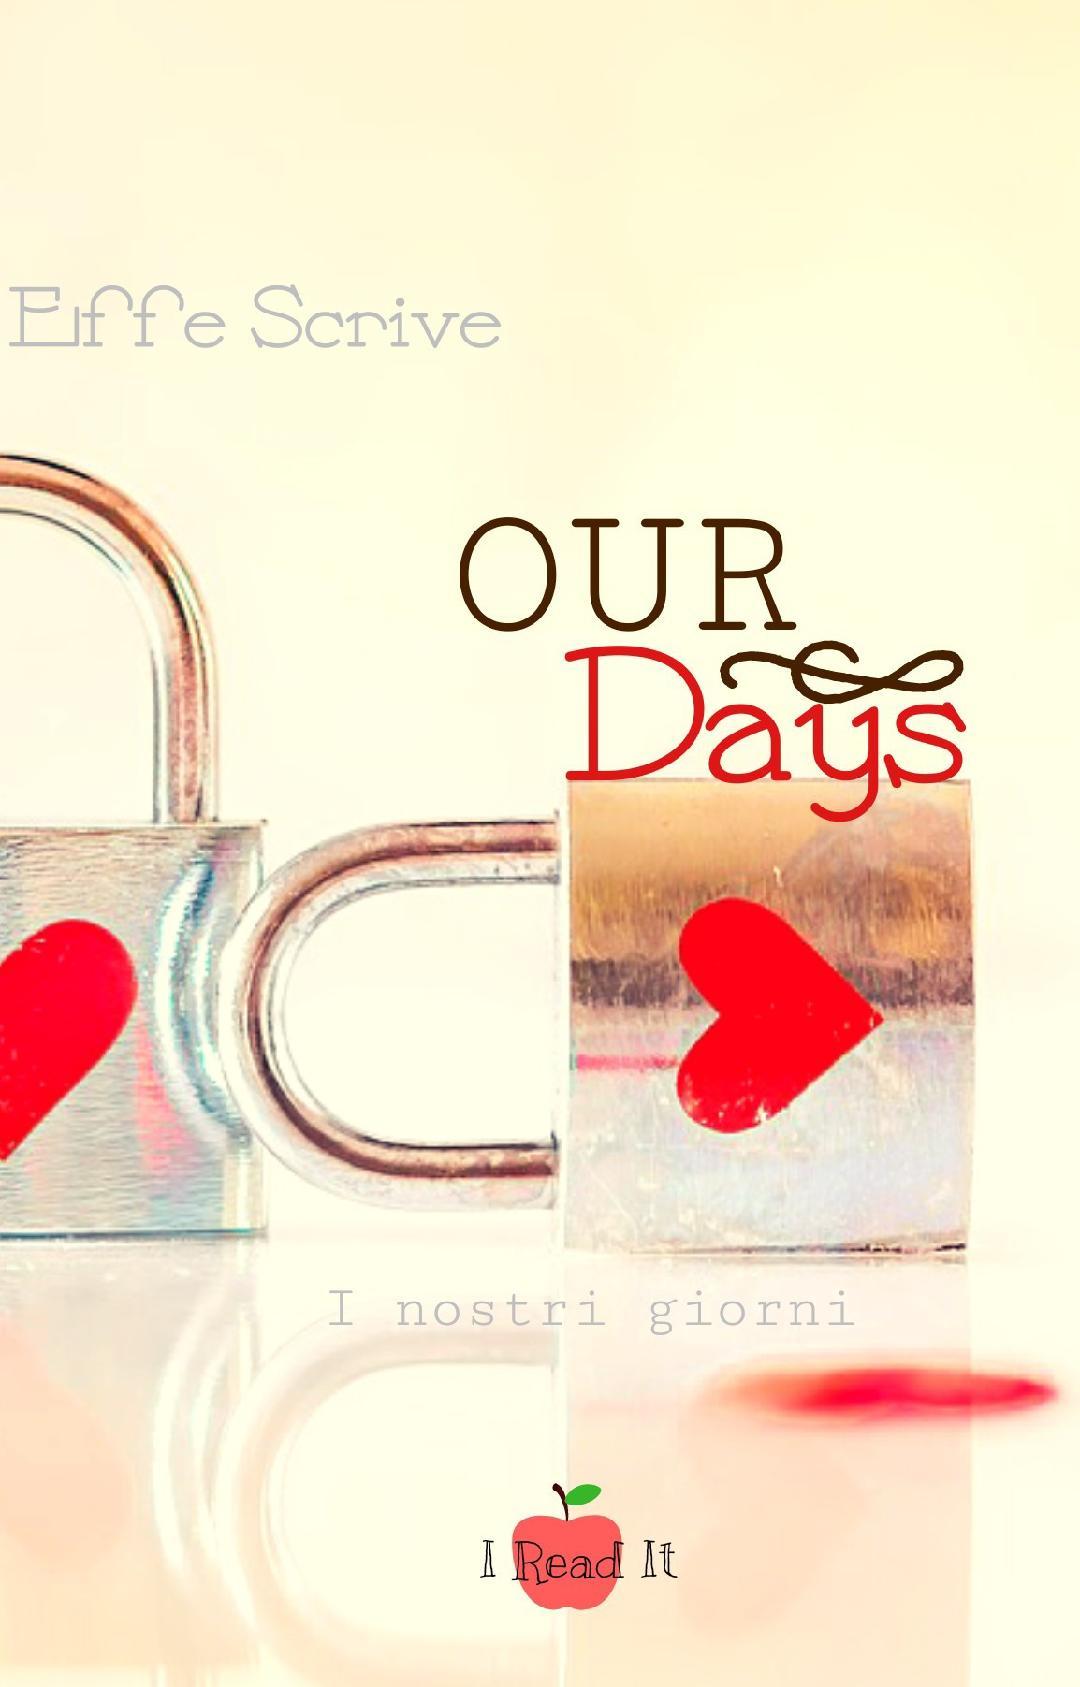 "Anteprima,""OUR DAYS, i nostri giorni ""di Effe Scrive."